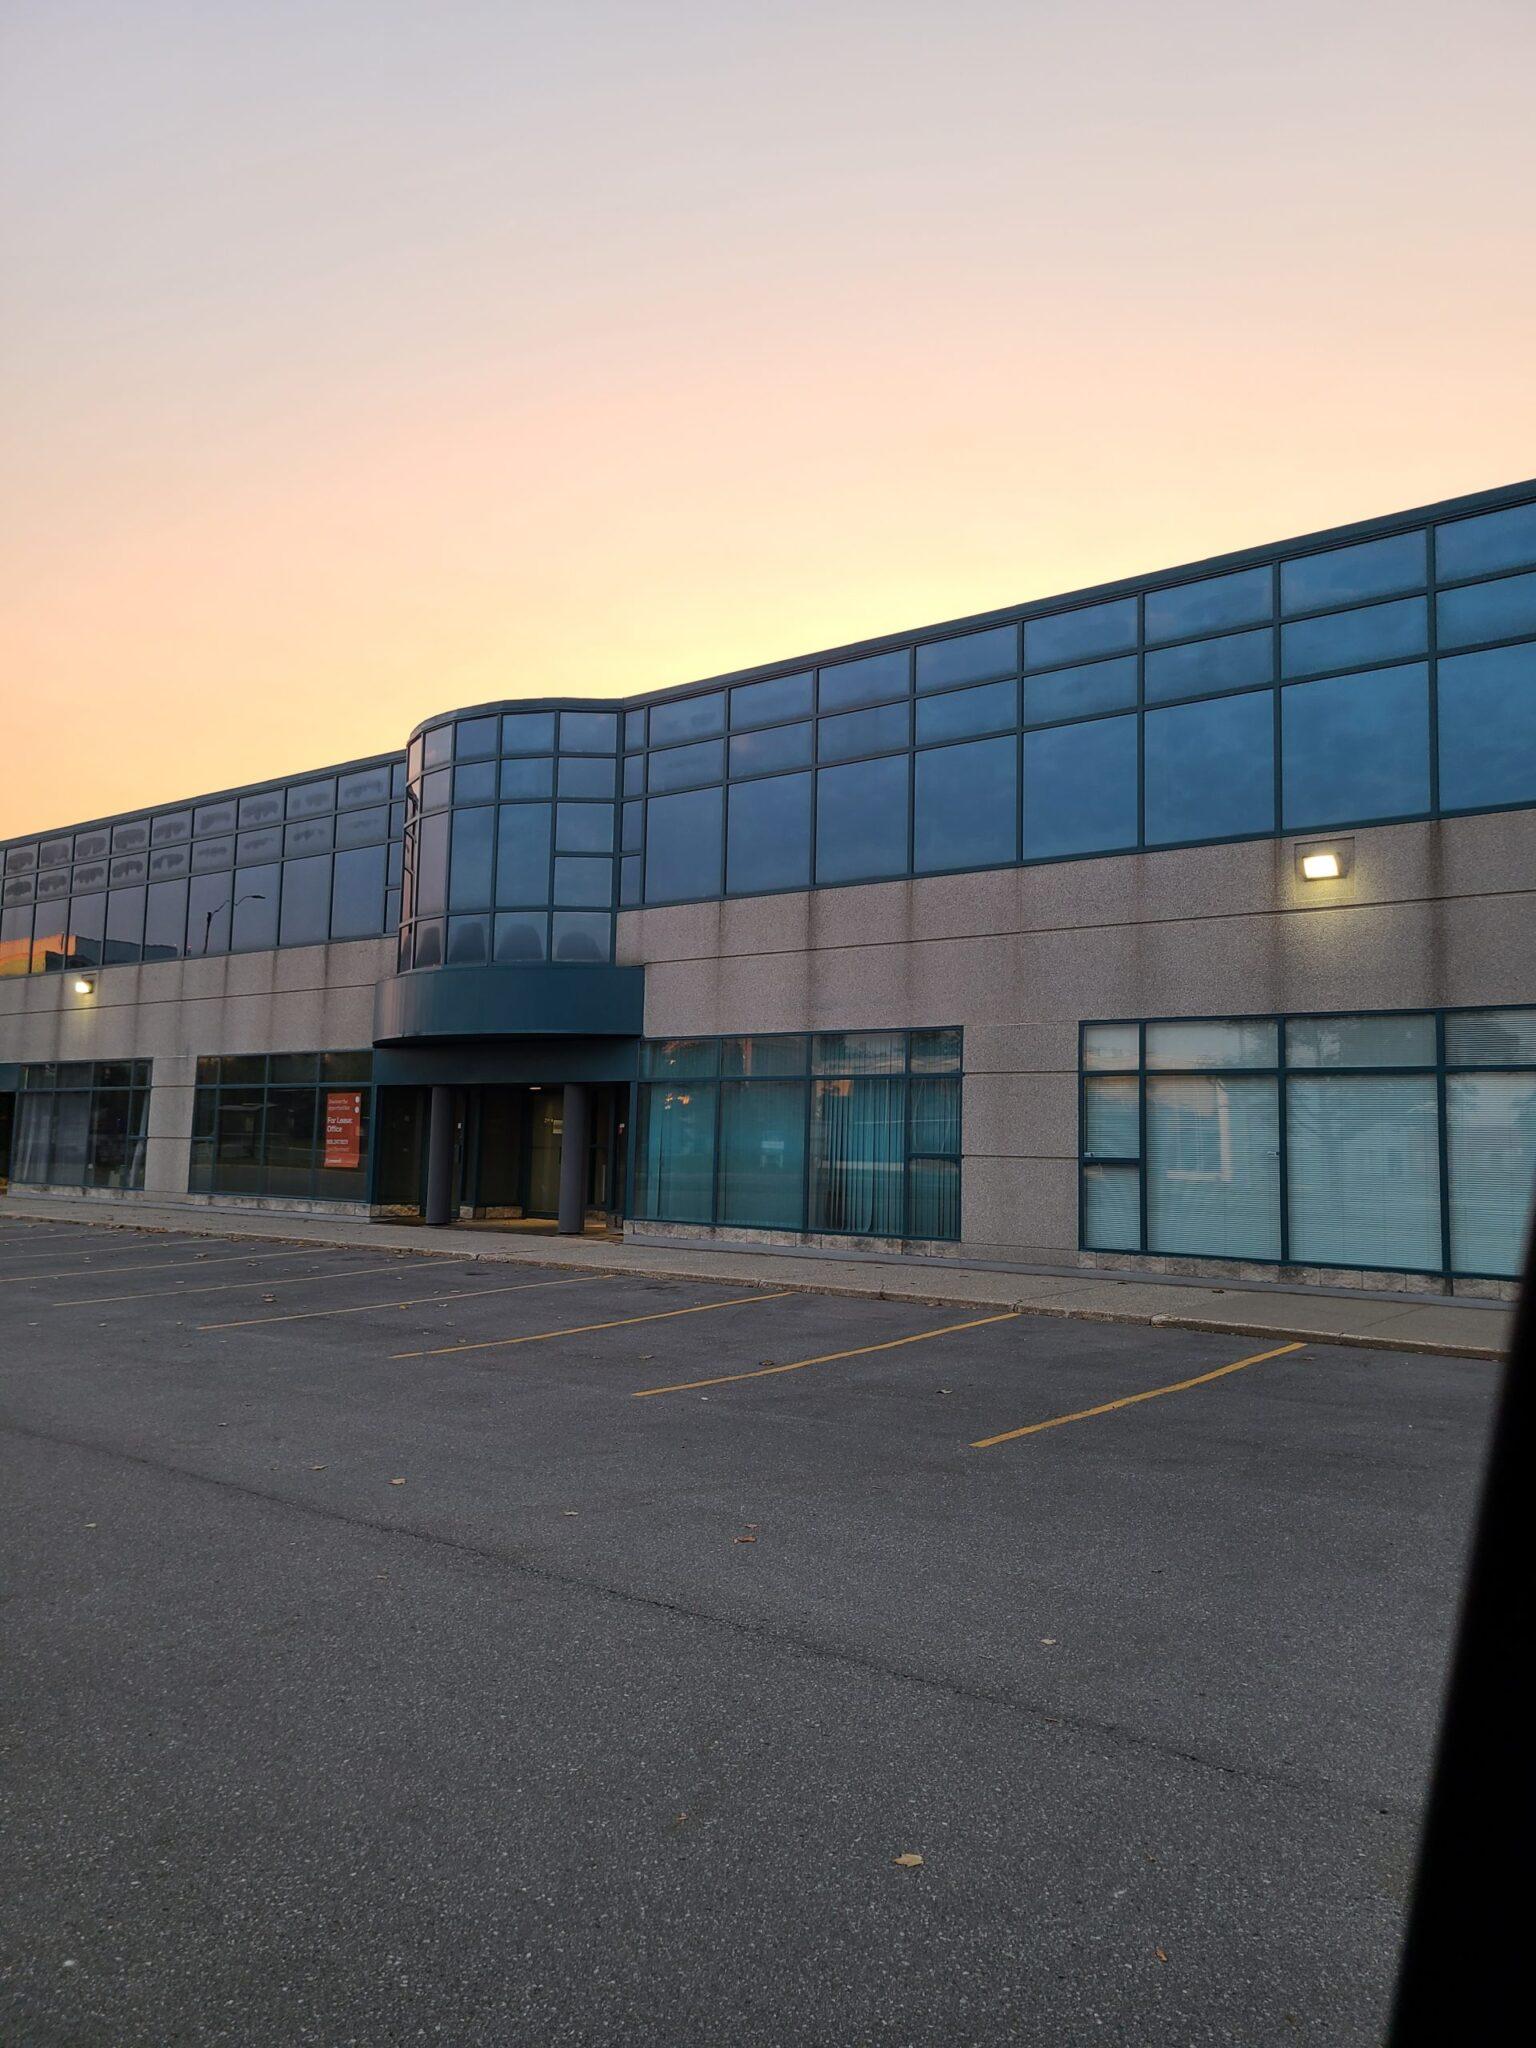 matheson dr commercial exterior images